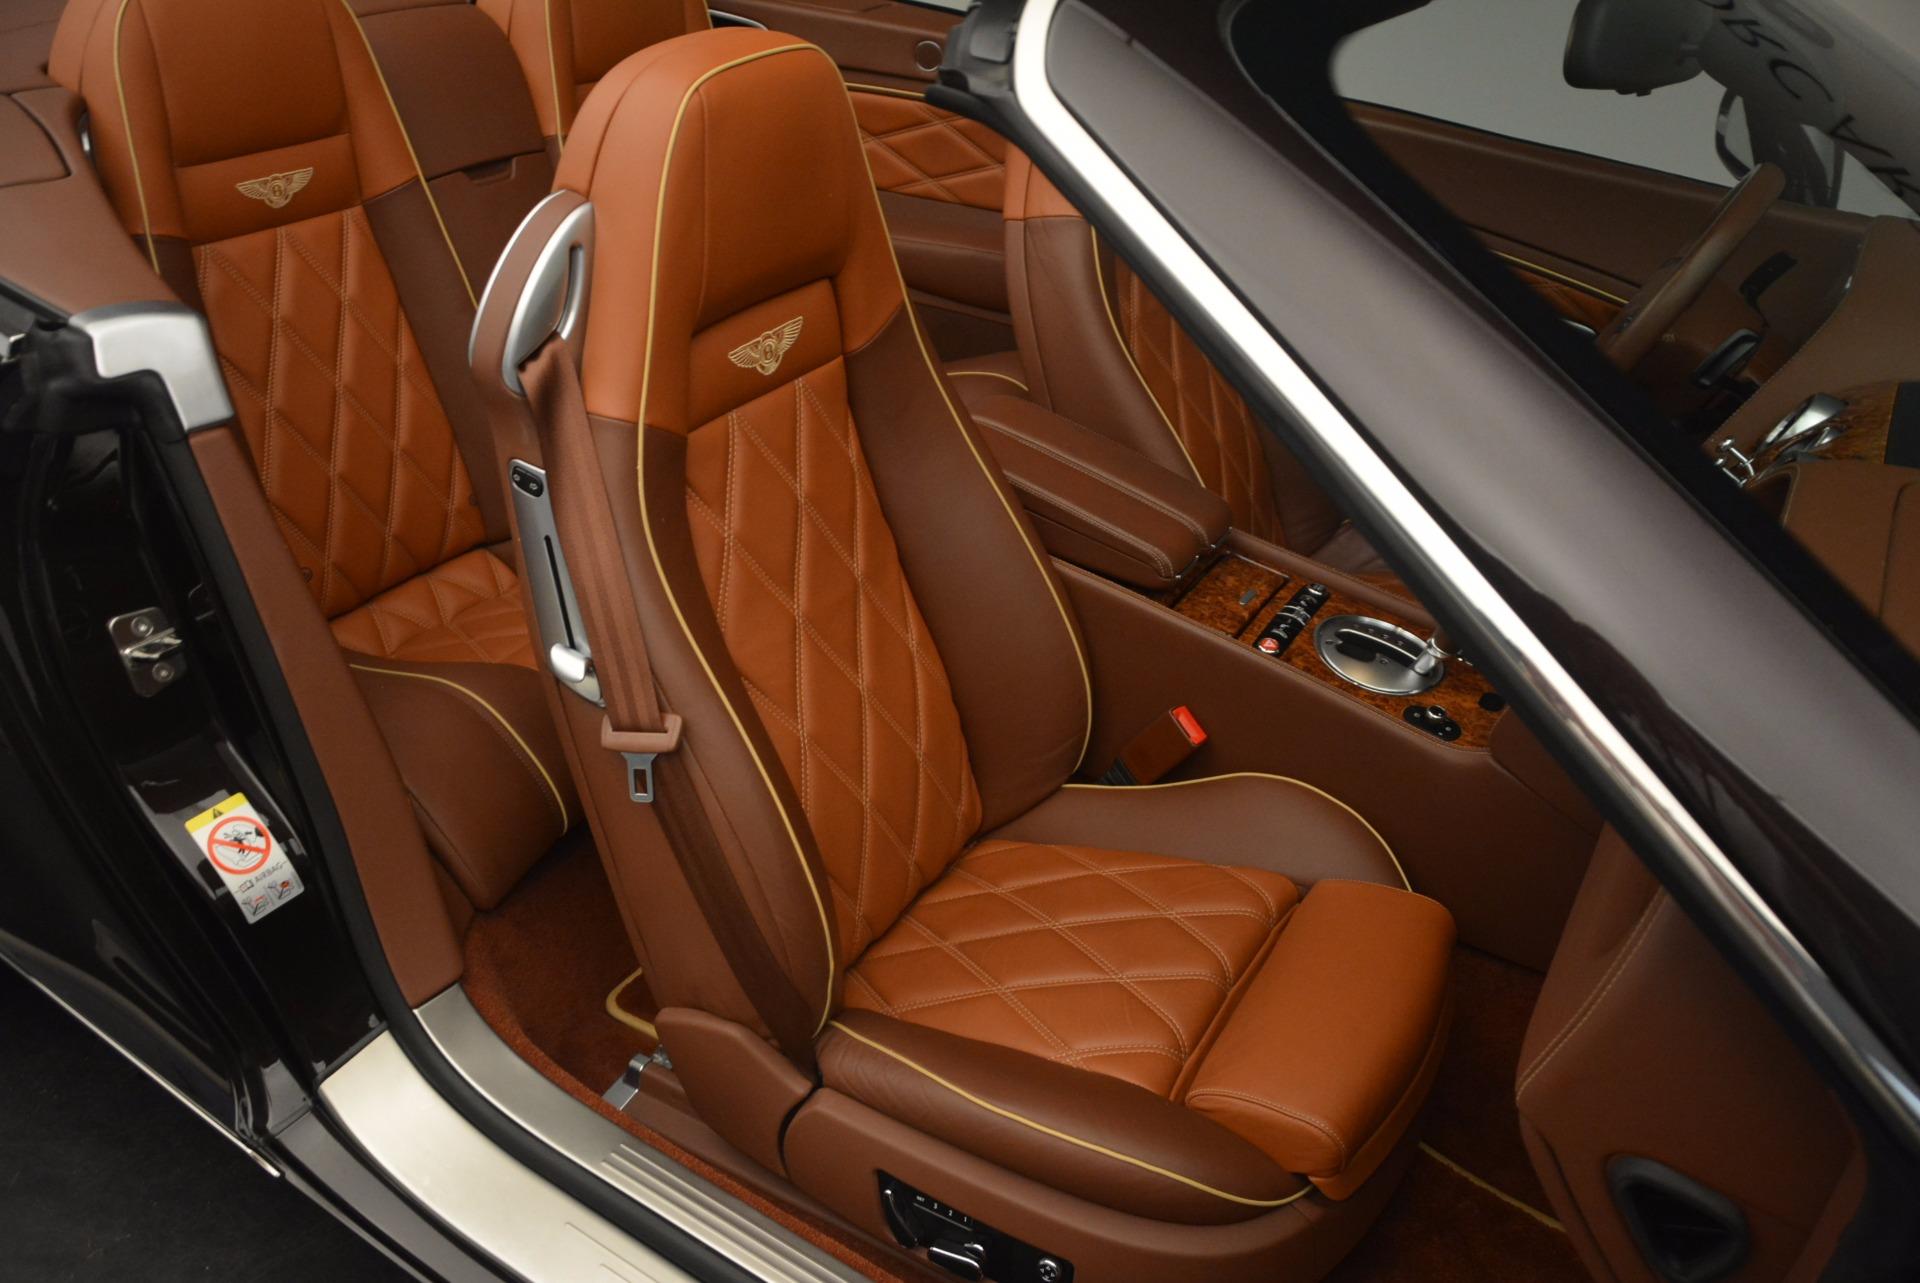 Used 2010 Bentley Continental GT Series 51 For Sale In Westport, CT 1222_p43